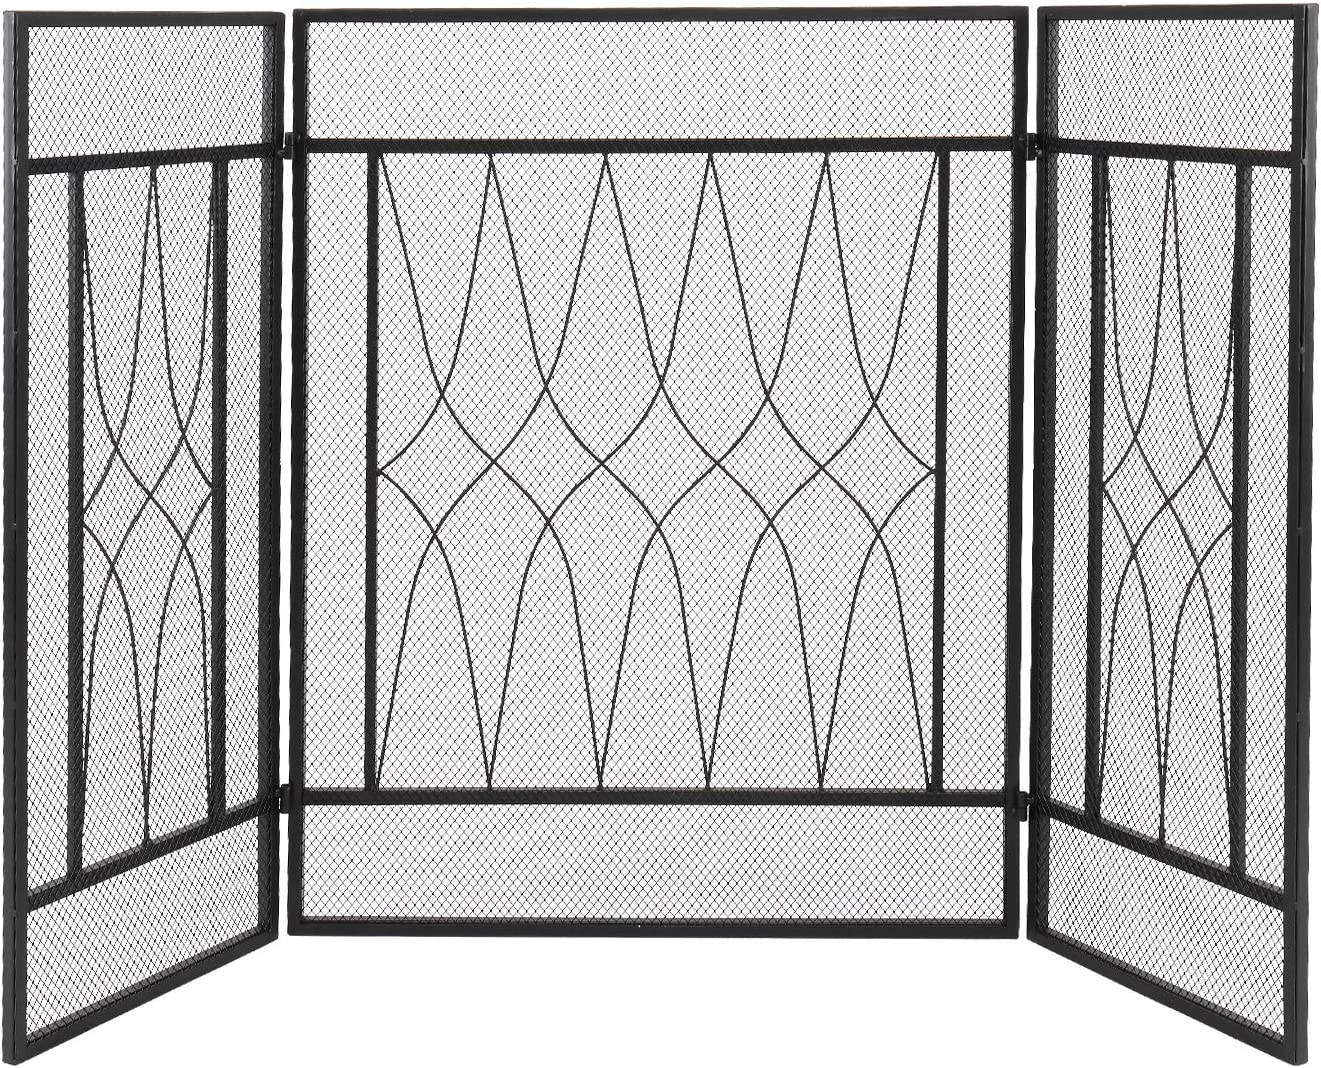 Veryke Iron sale Mesh Fireplace Screen Max 53% OFF Spark Panels Guard 3